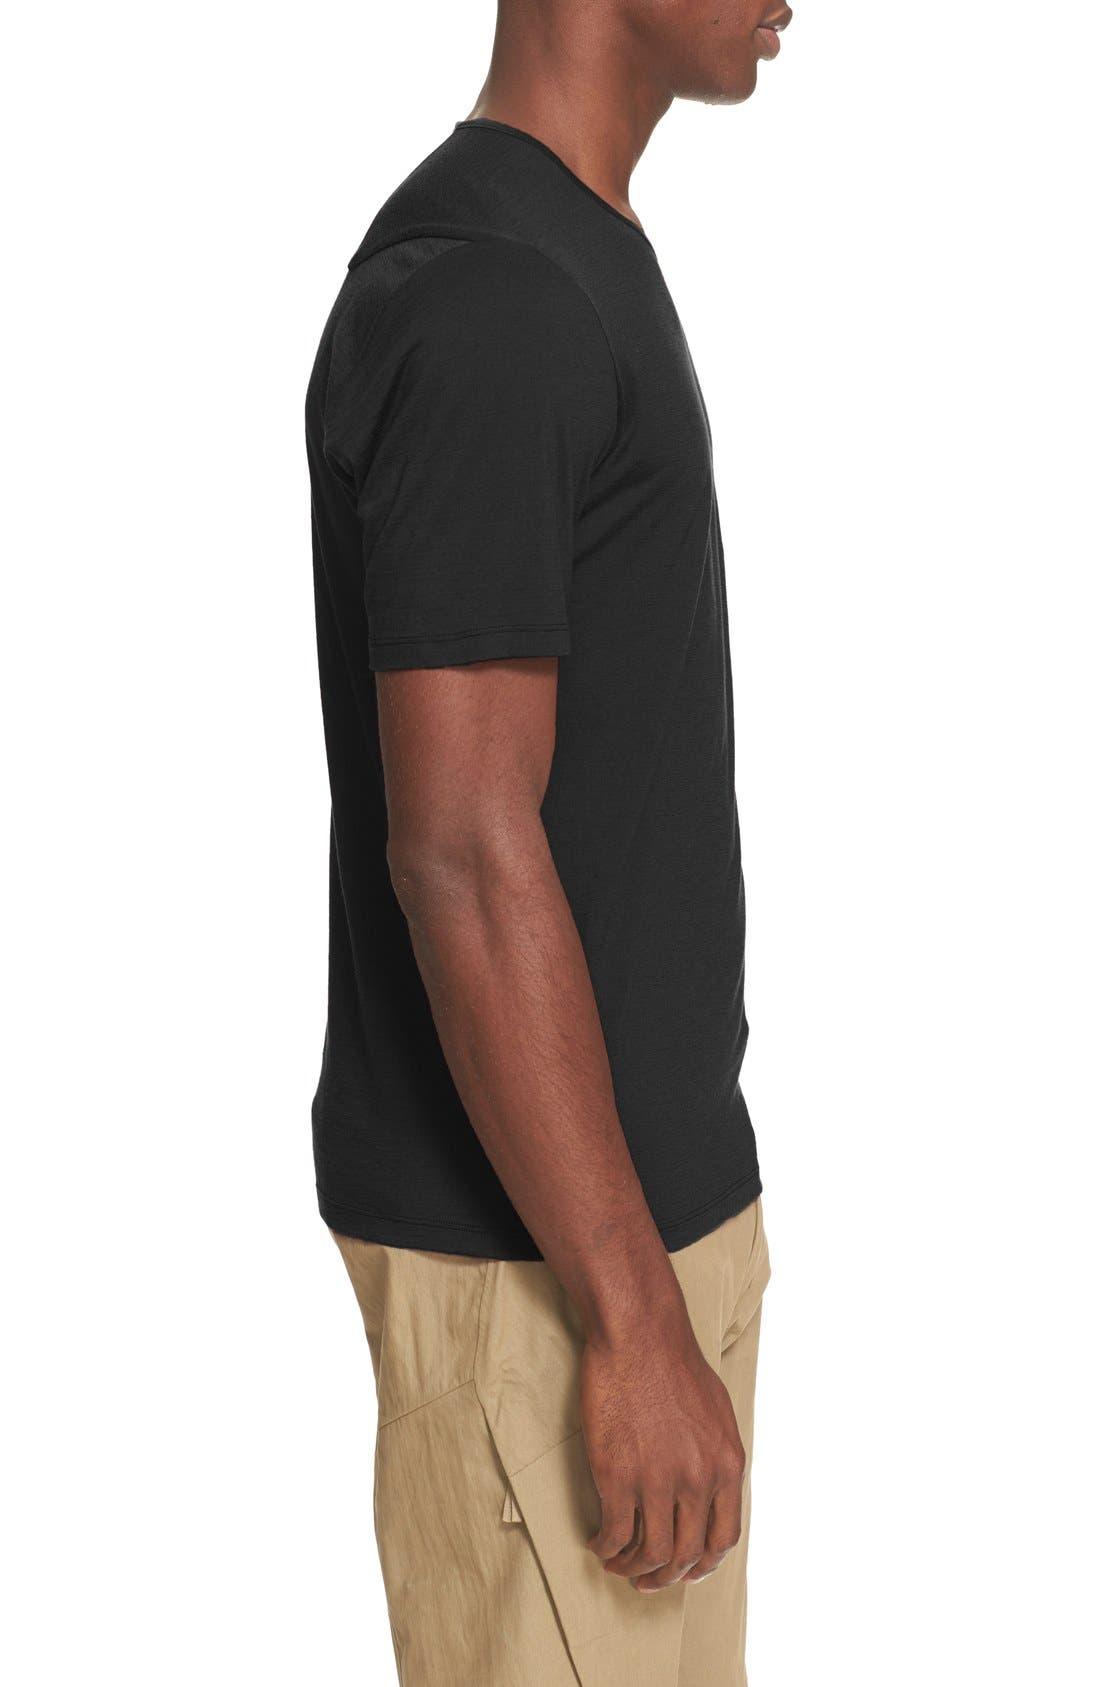 ARC'TERYX VEILANCE,                             'Frame' Merino Wool T-Shirt,                             Alternate thumbnail 3, color,                             001